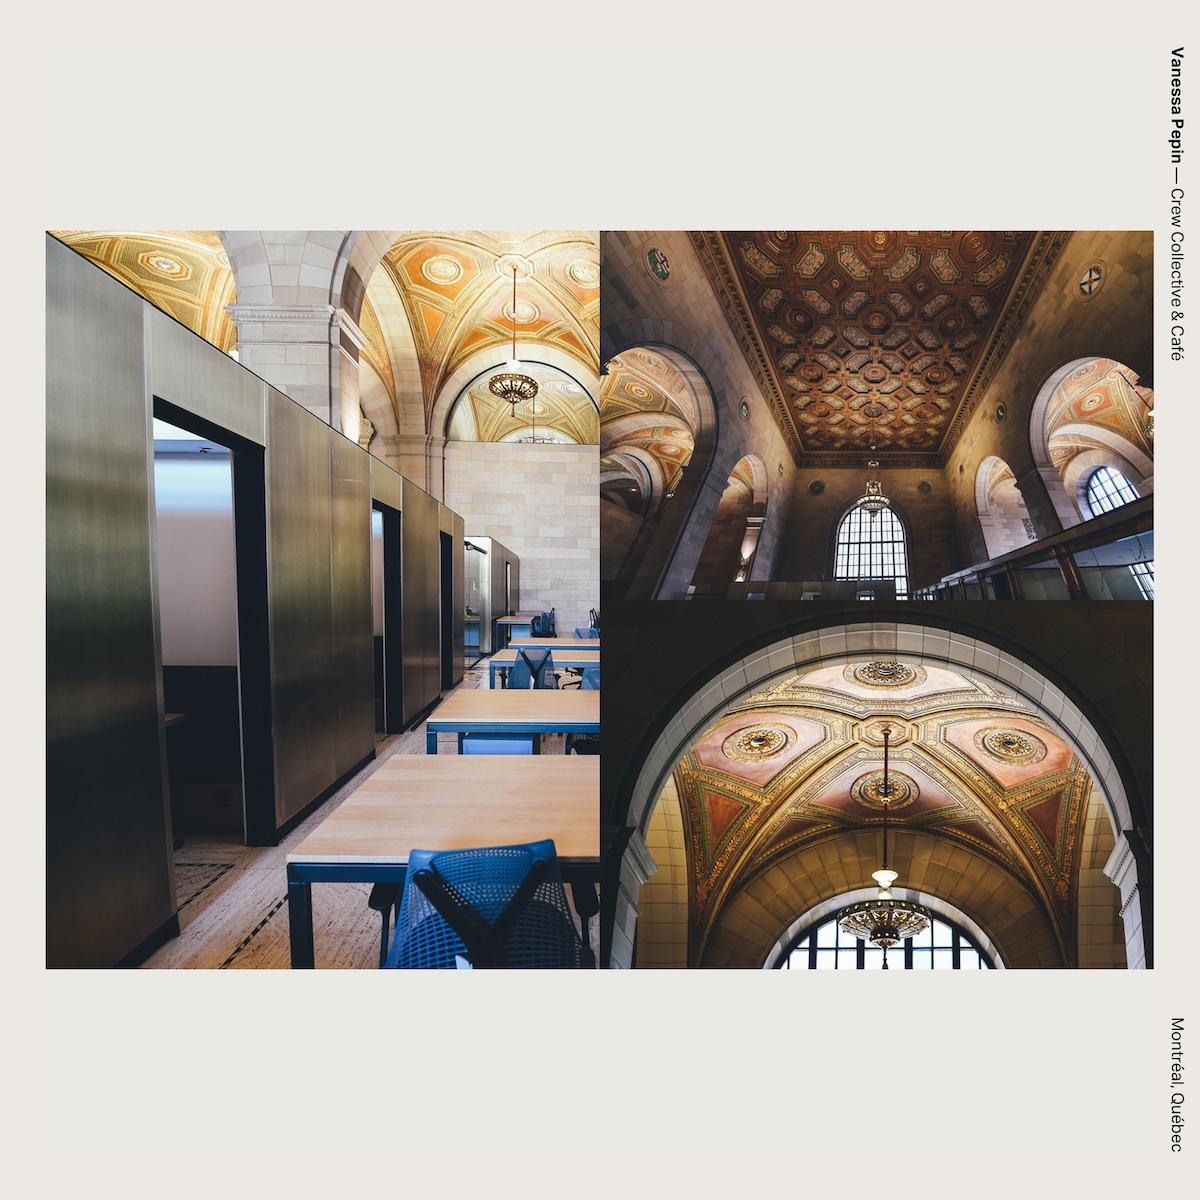 Vanessa Pepin — Crew Collective & Café